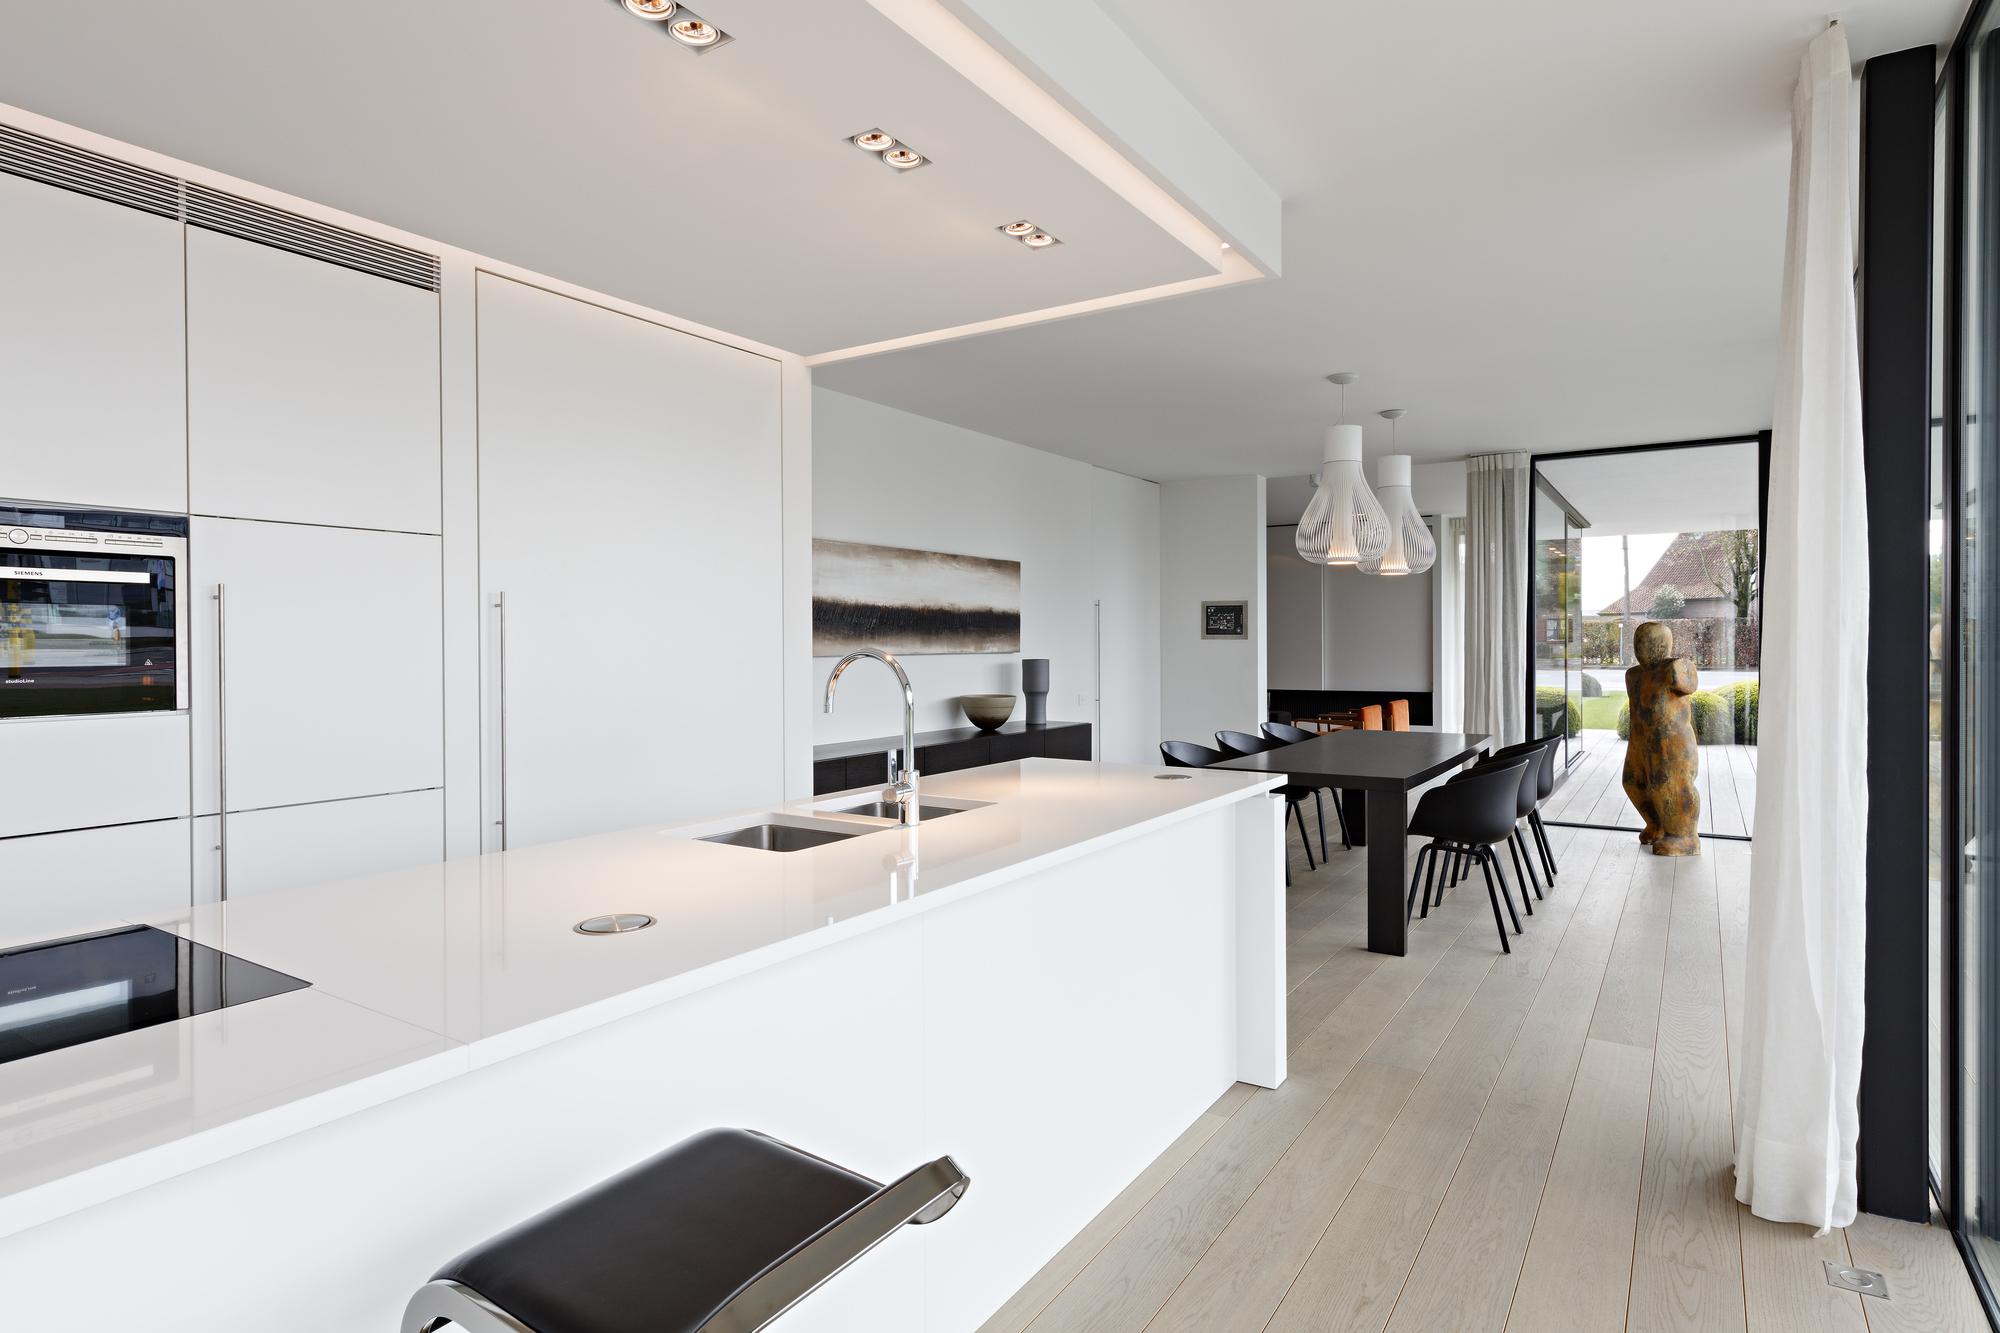 Witte Laminaat Keuken : Ontdek uw keuken en interieur trybou keukens